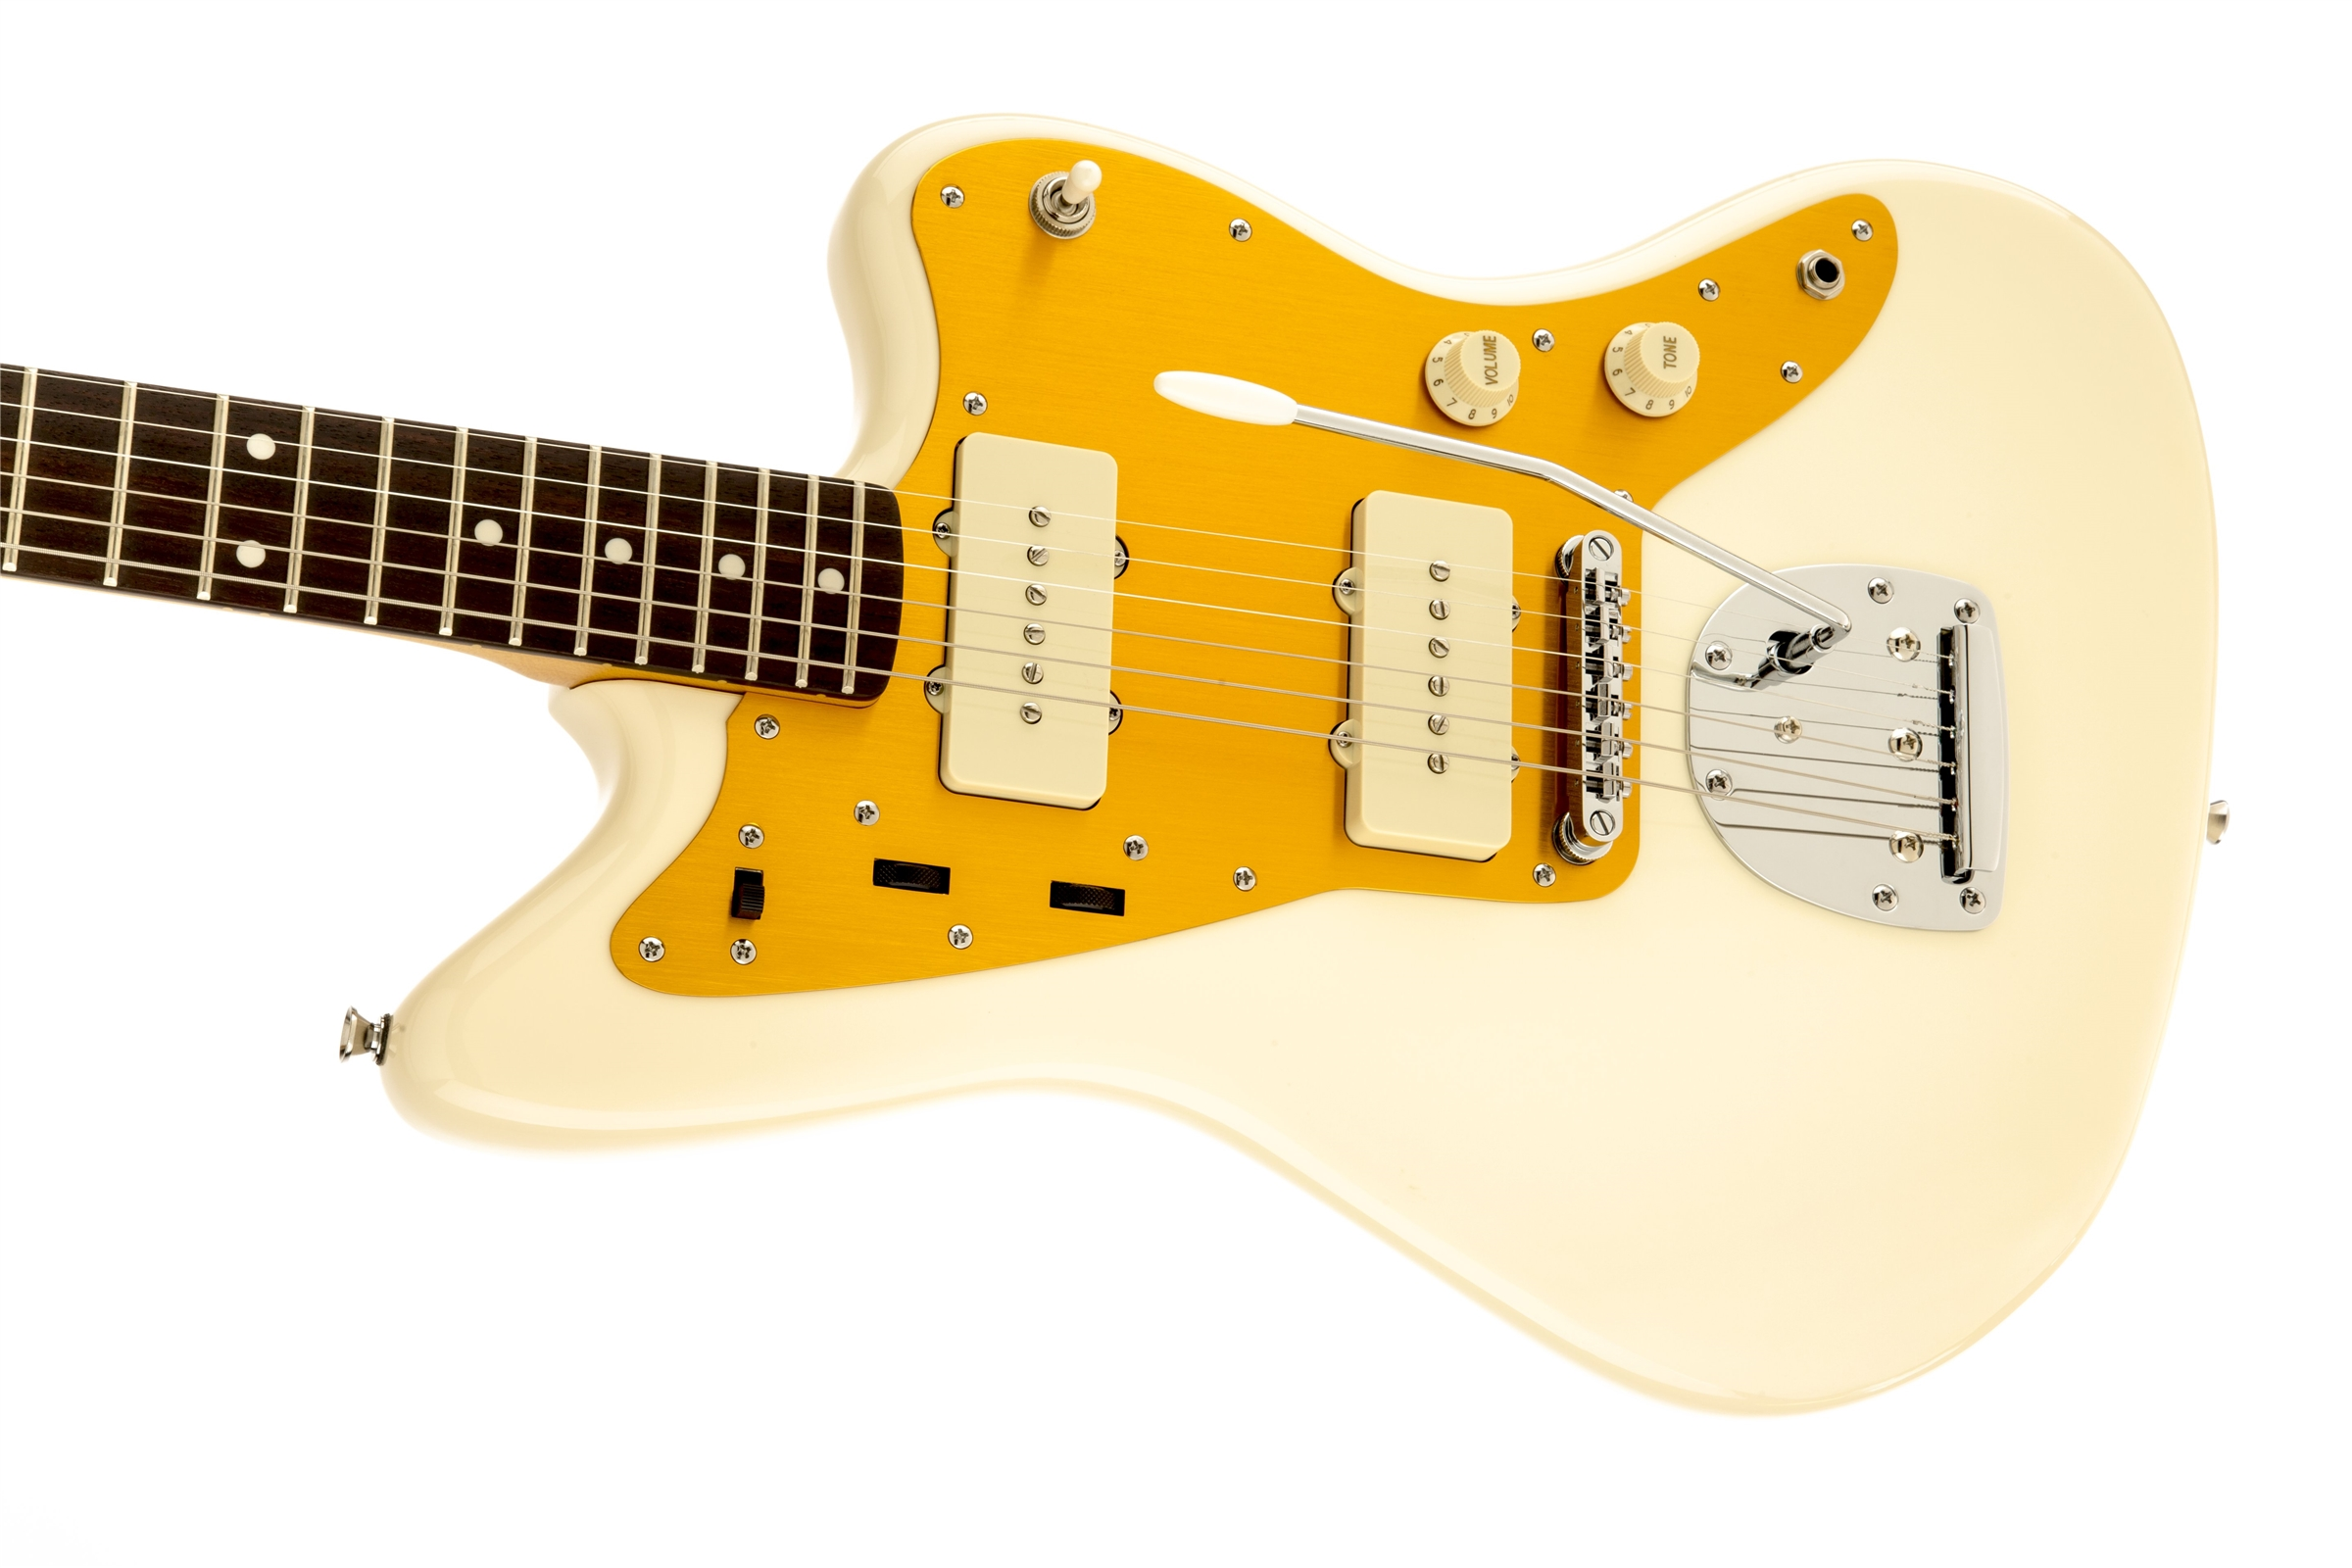 squier� j mascis jazzmaster� squier electric guitars Fender Jaguar Wiring Kit Fender Jaguar Wiring mascis jazzmaster wiring diagram